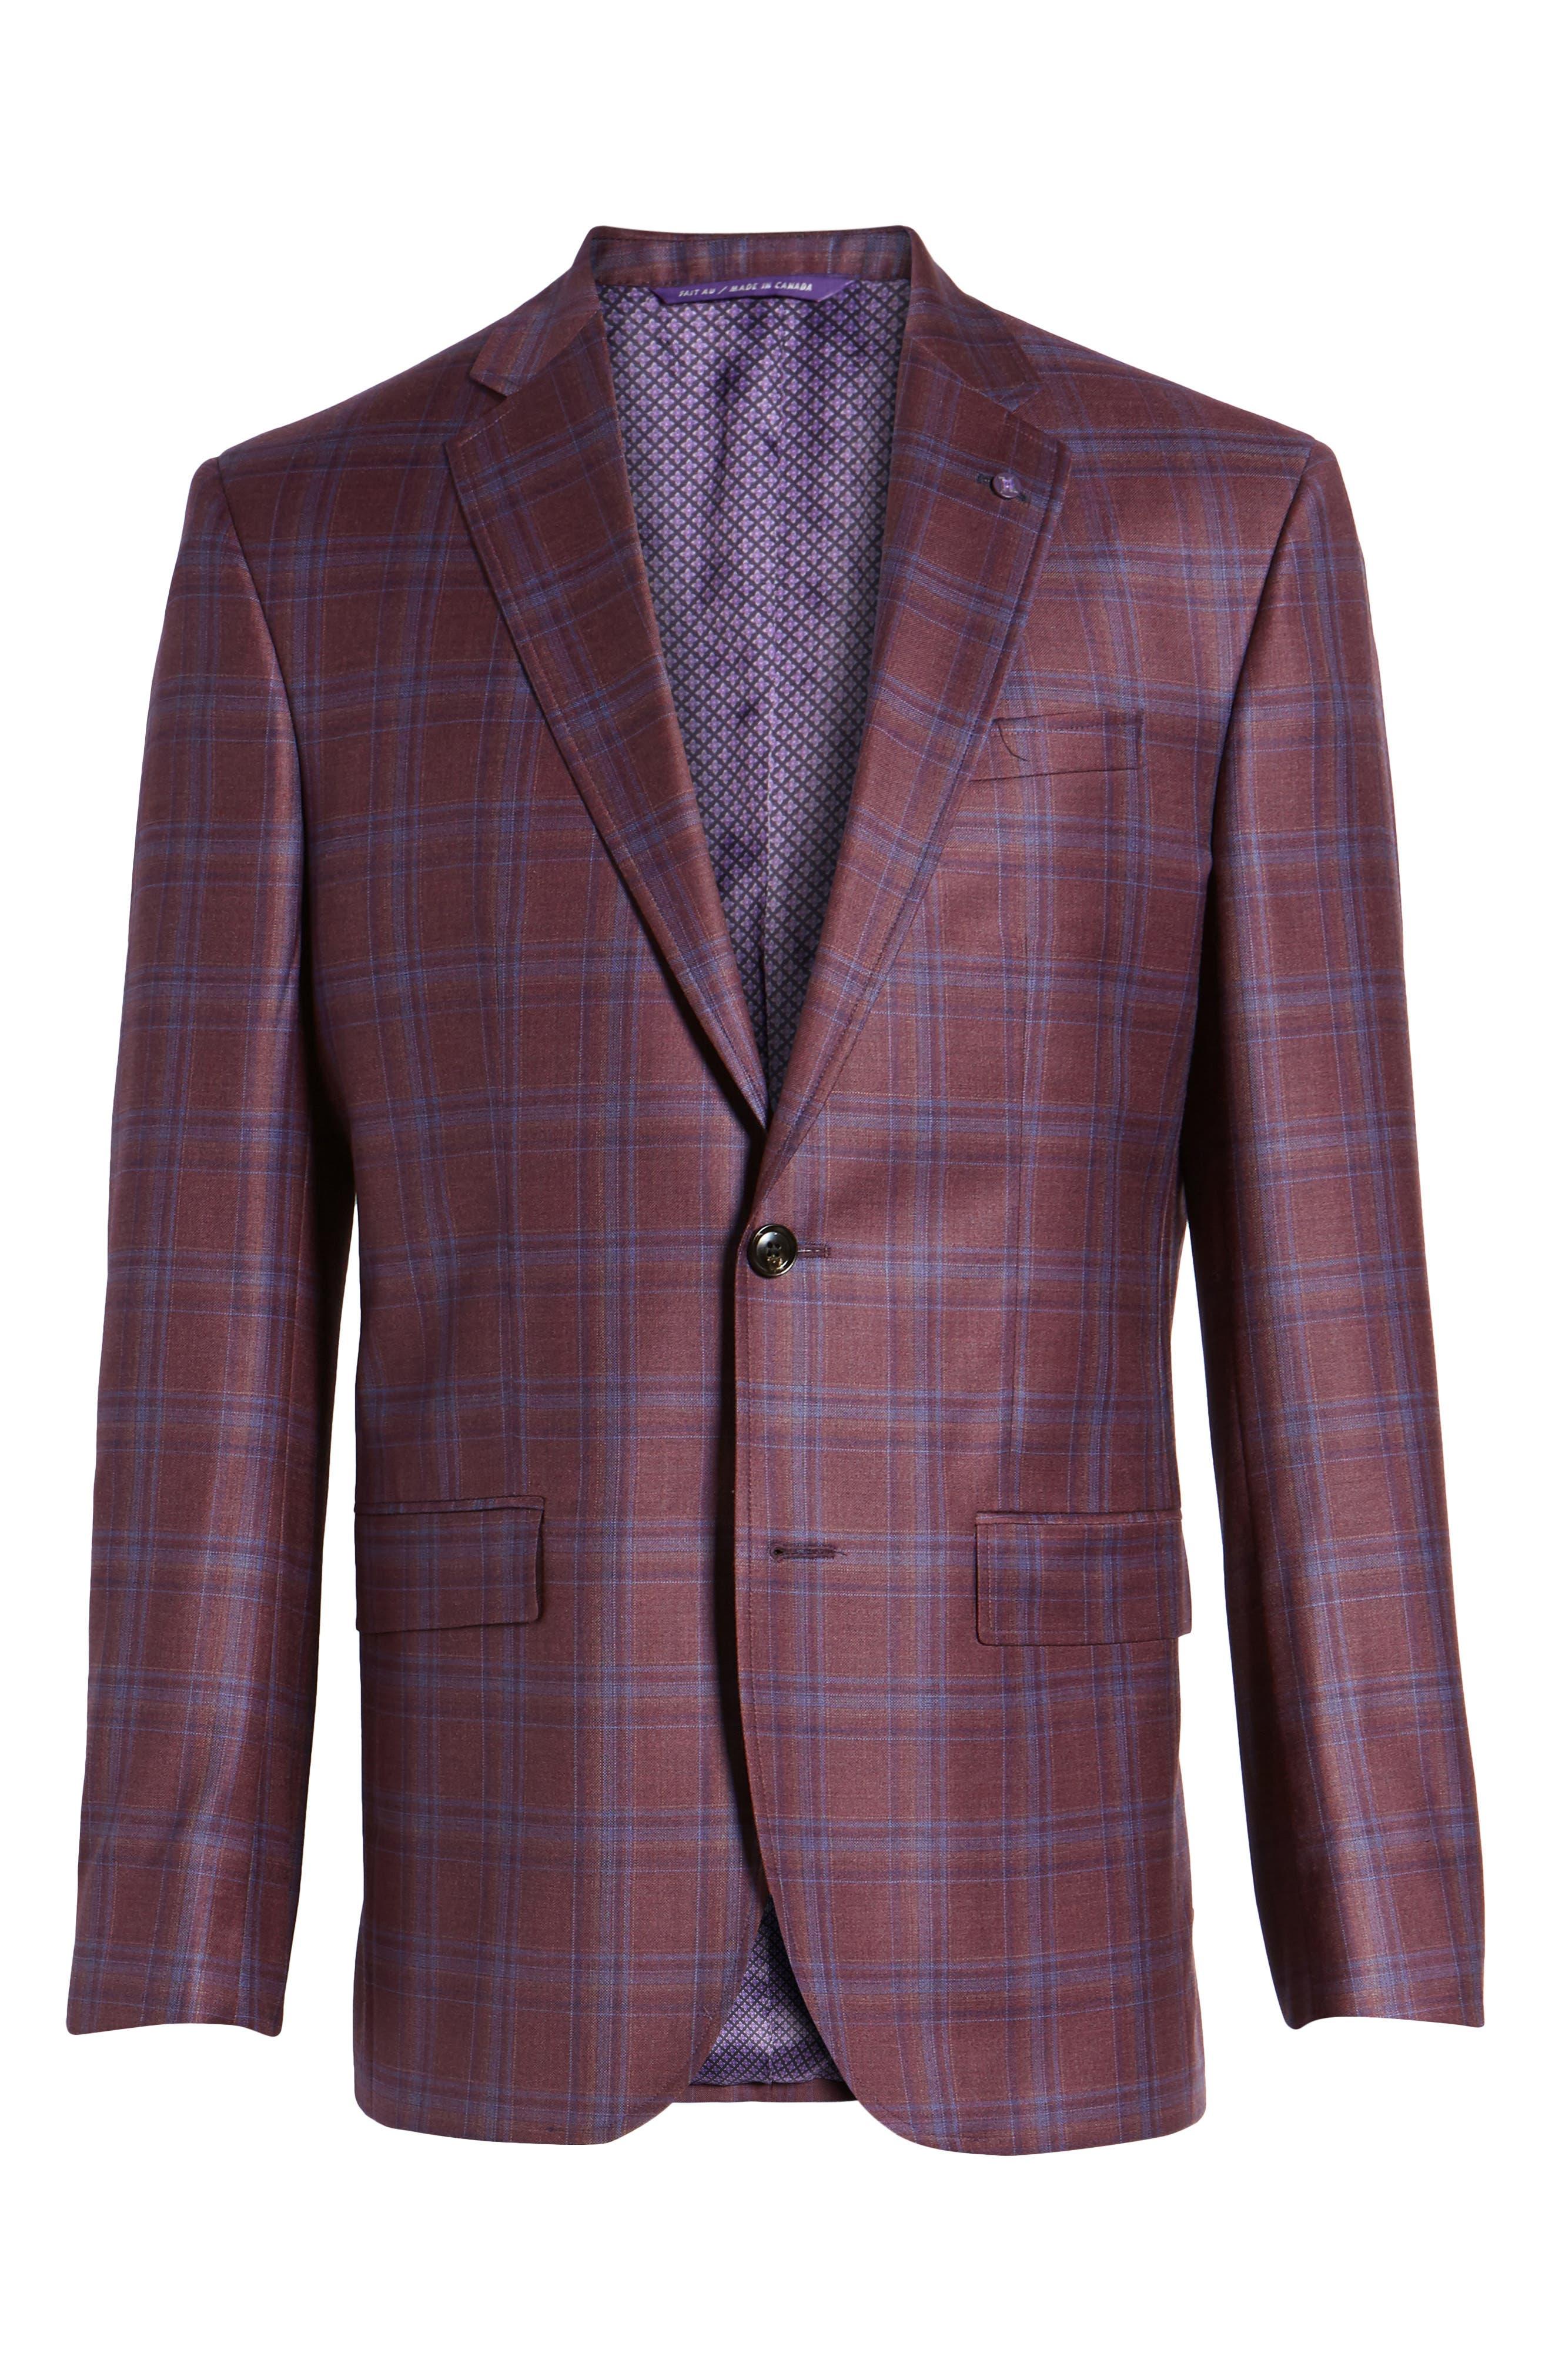 Jay Trim Fit Plaid Wool Sport Coat,                             Alternate thumbnail 5, color,                             600